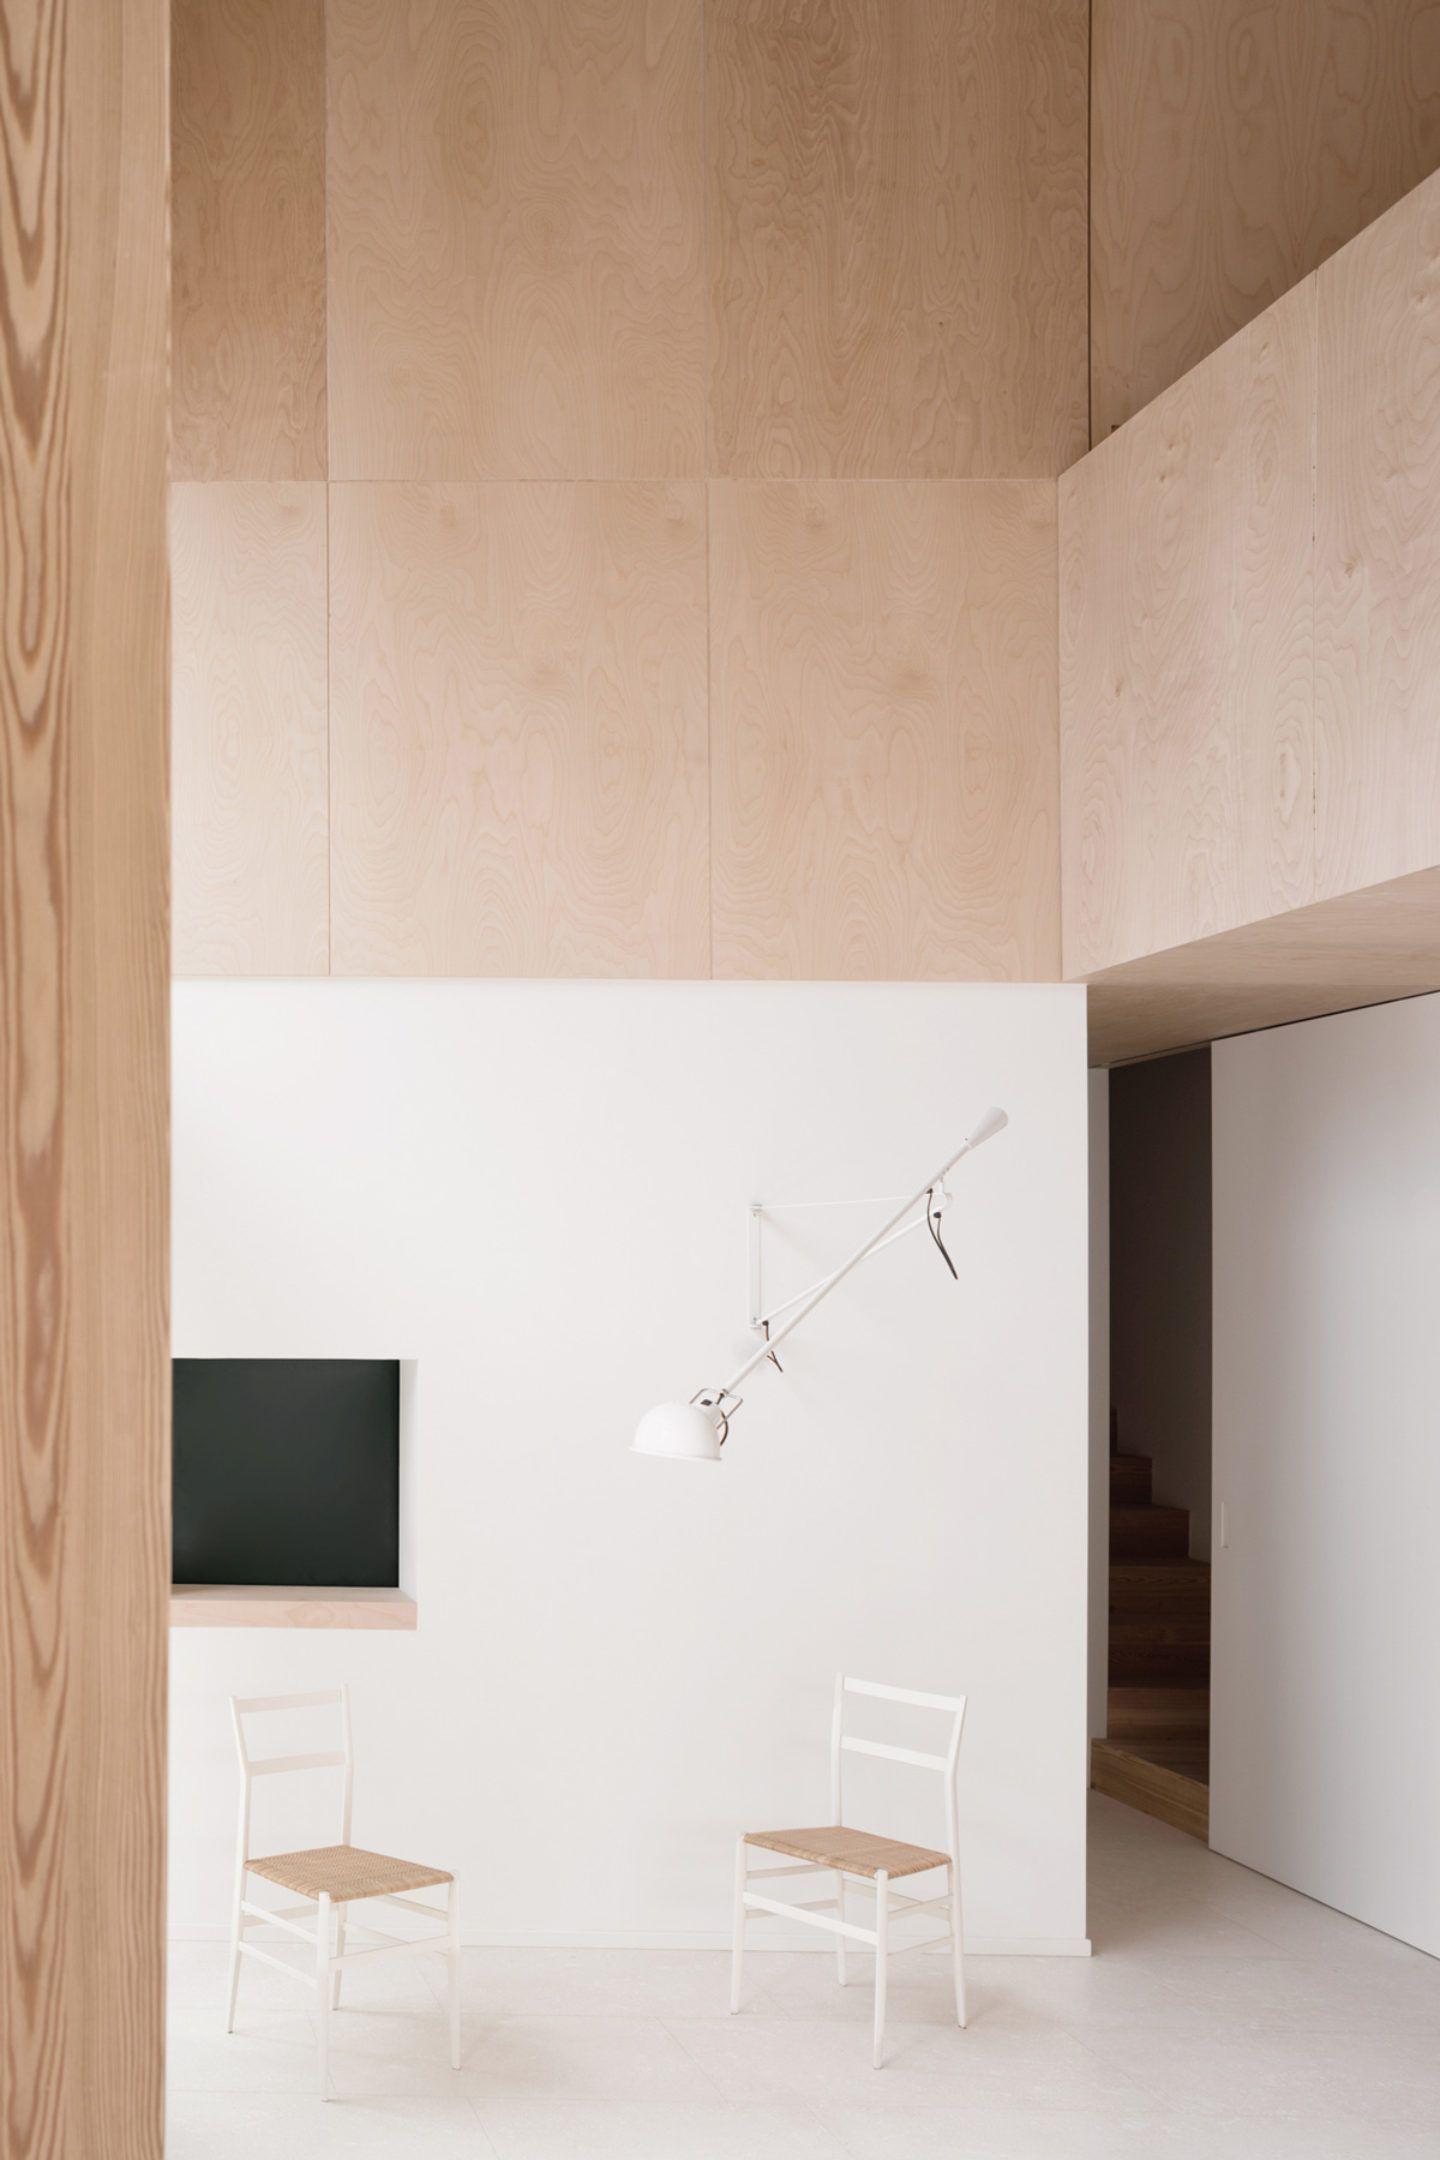 IGNANT-Architecture-Studio-Wok-Country-Home-In-Chievo-7